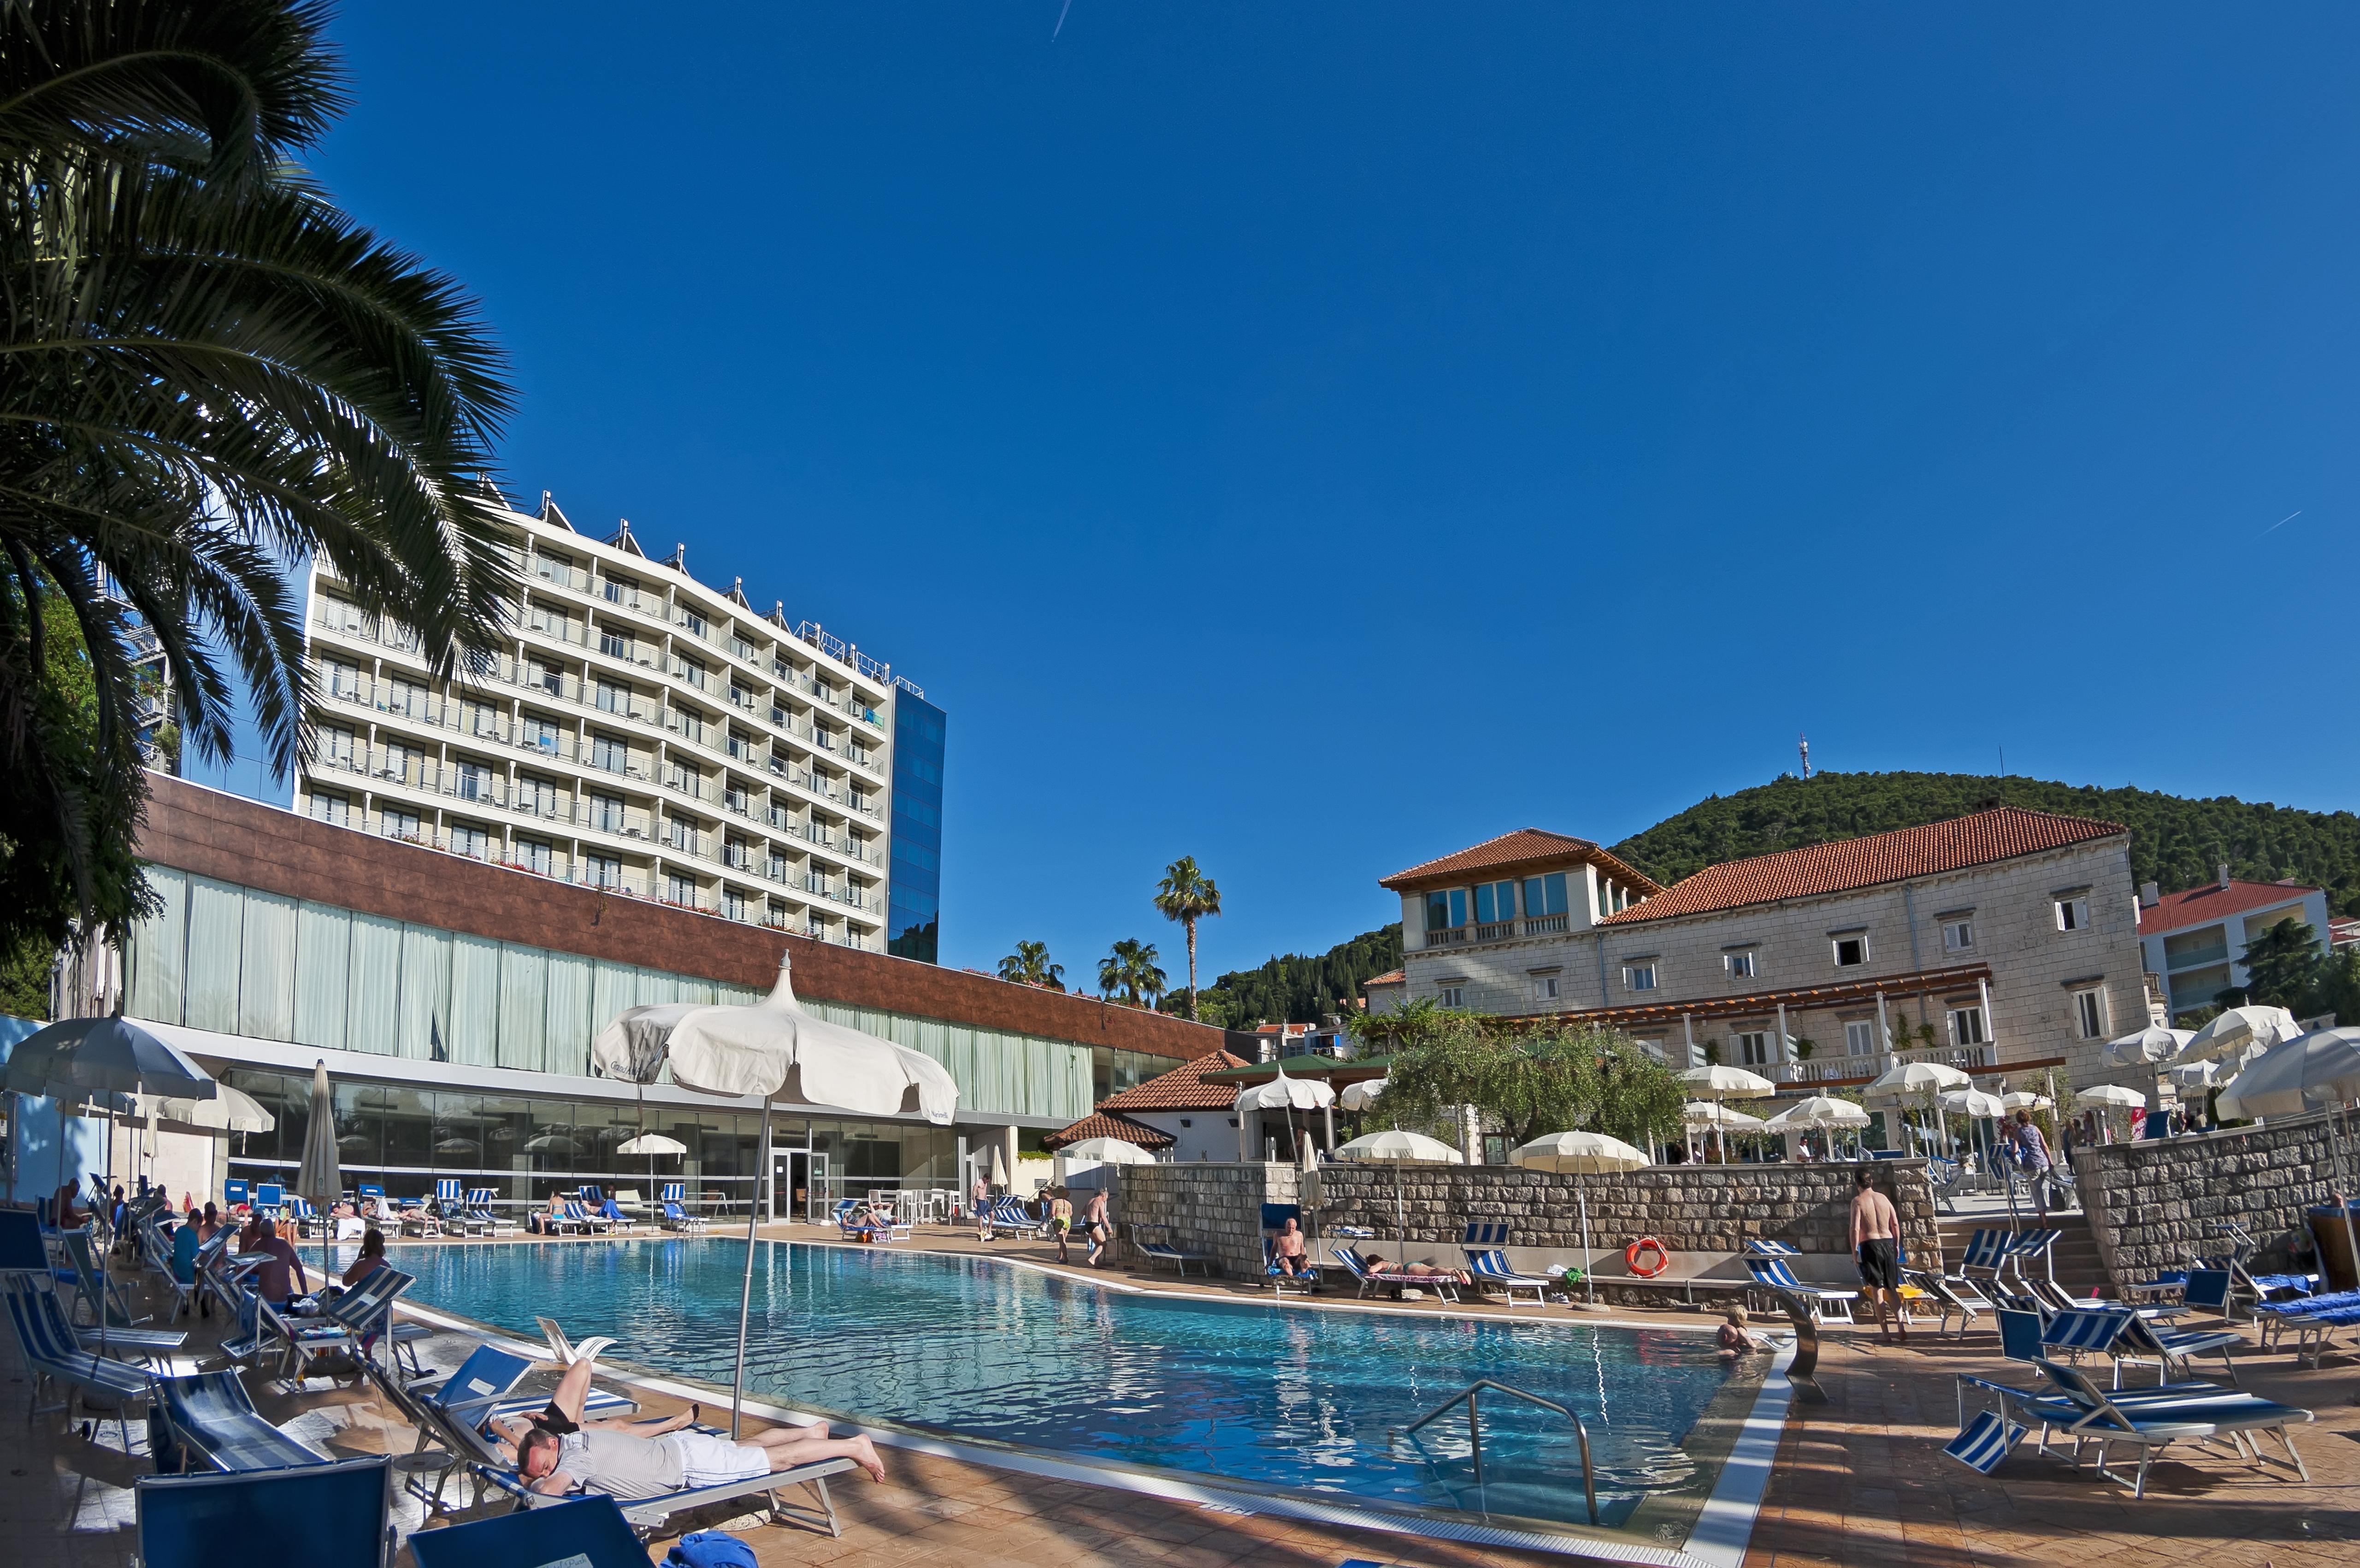 Grand Hotel Park 17